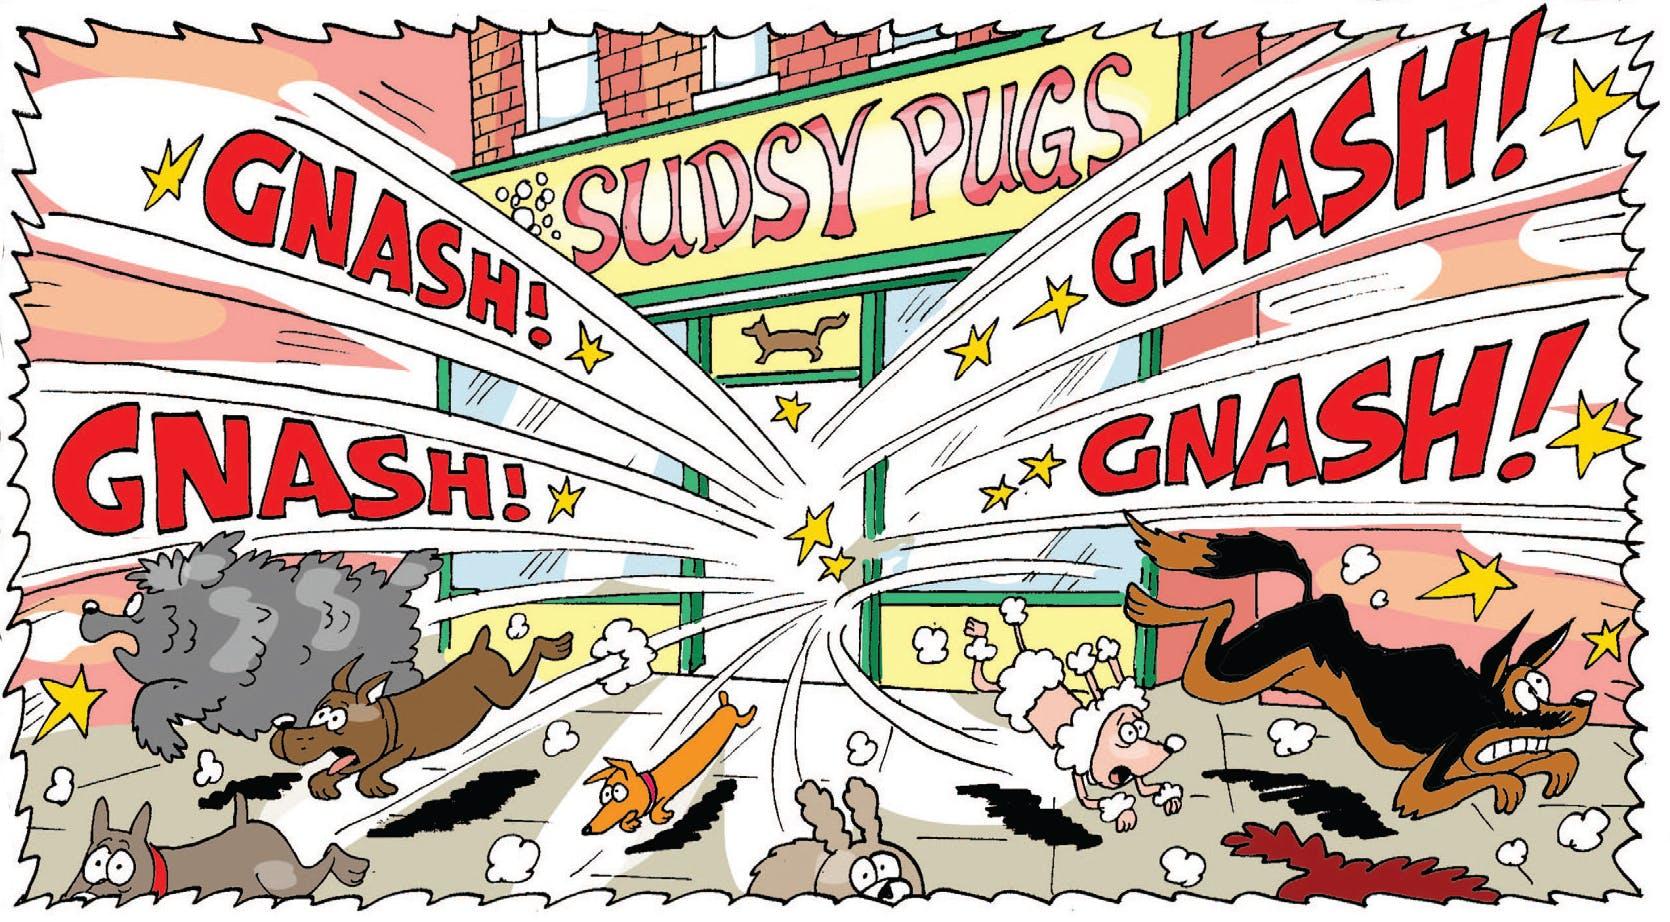 Gnasher trashes the dog salon